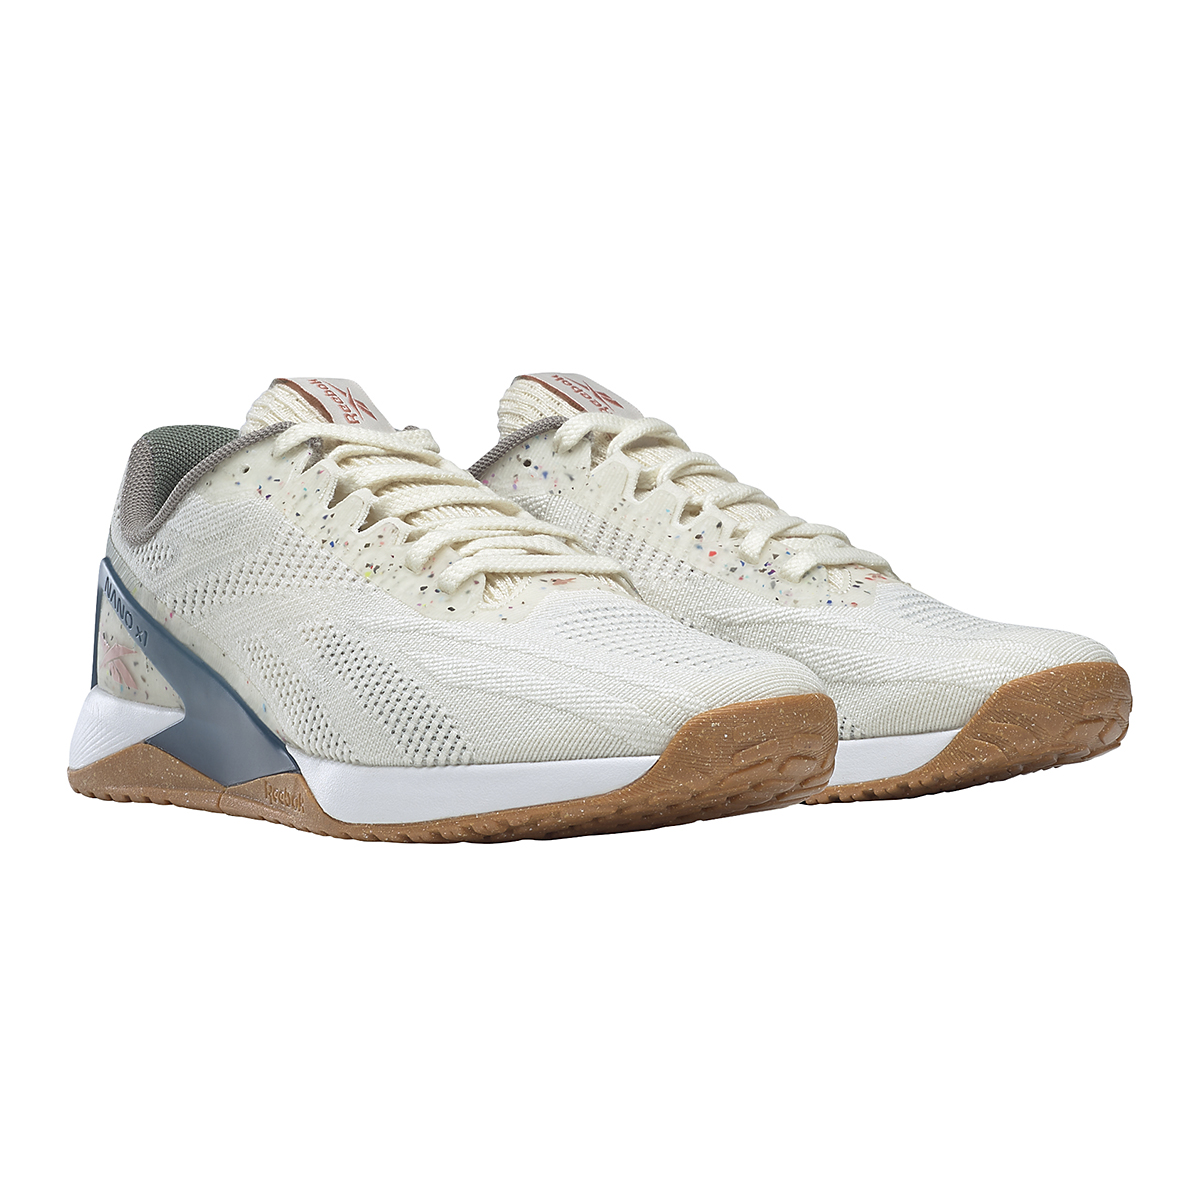 Women's Reebok Nano X1 Vegan Training Shoe - Color: Classic White/Harmony Green/Brave Blue - Size: 5 - Width: Regular, Classic White/Harmony Green/Brave Blue, large, image 3